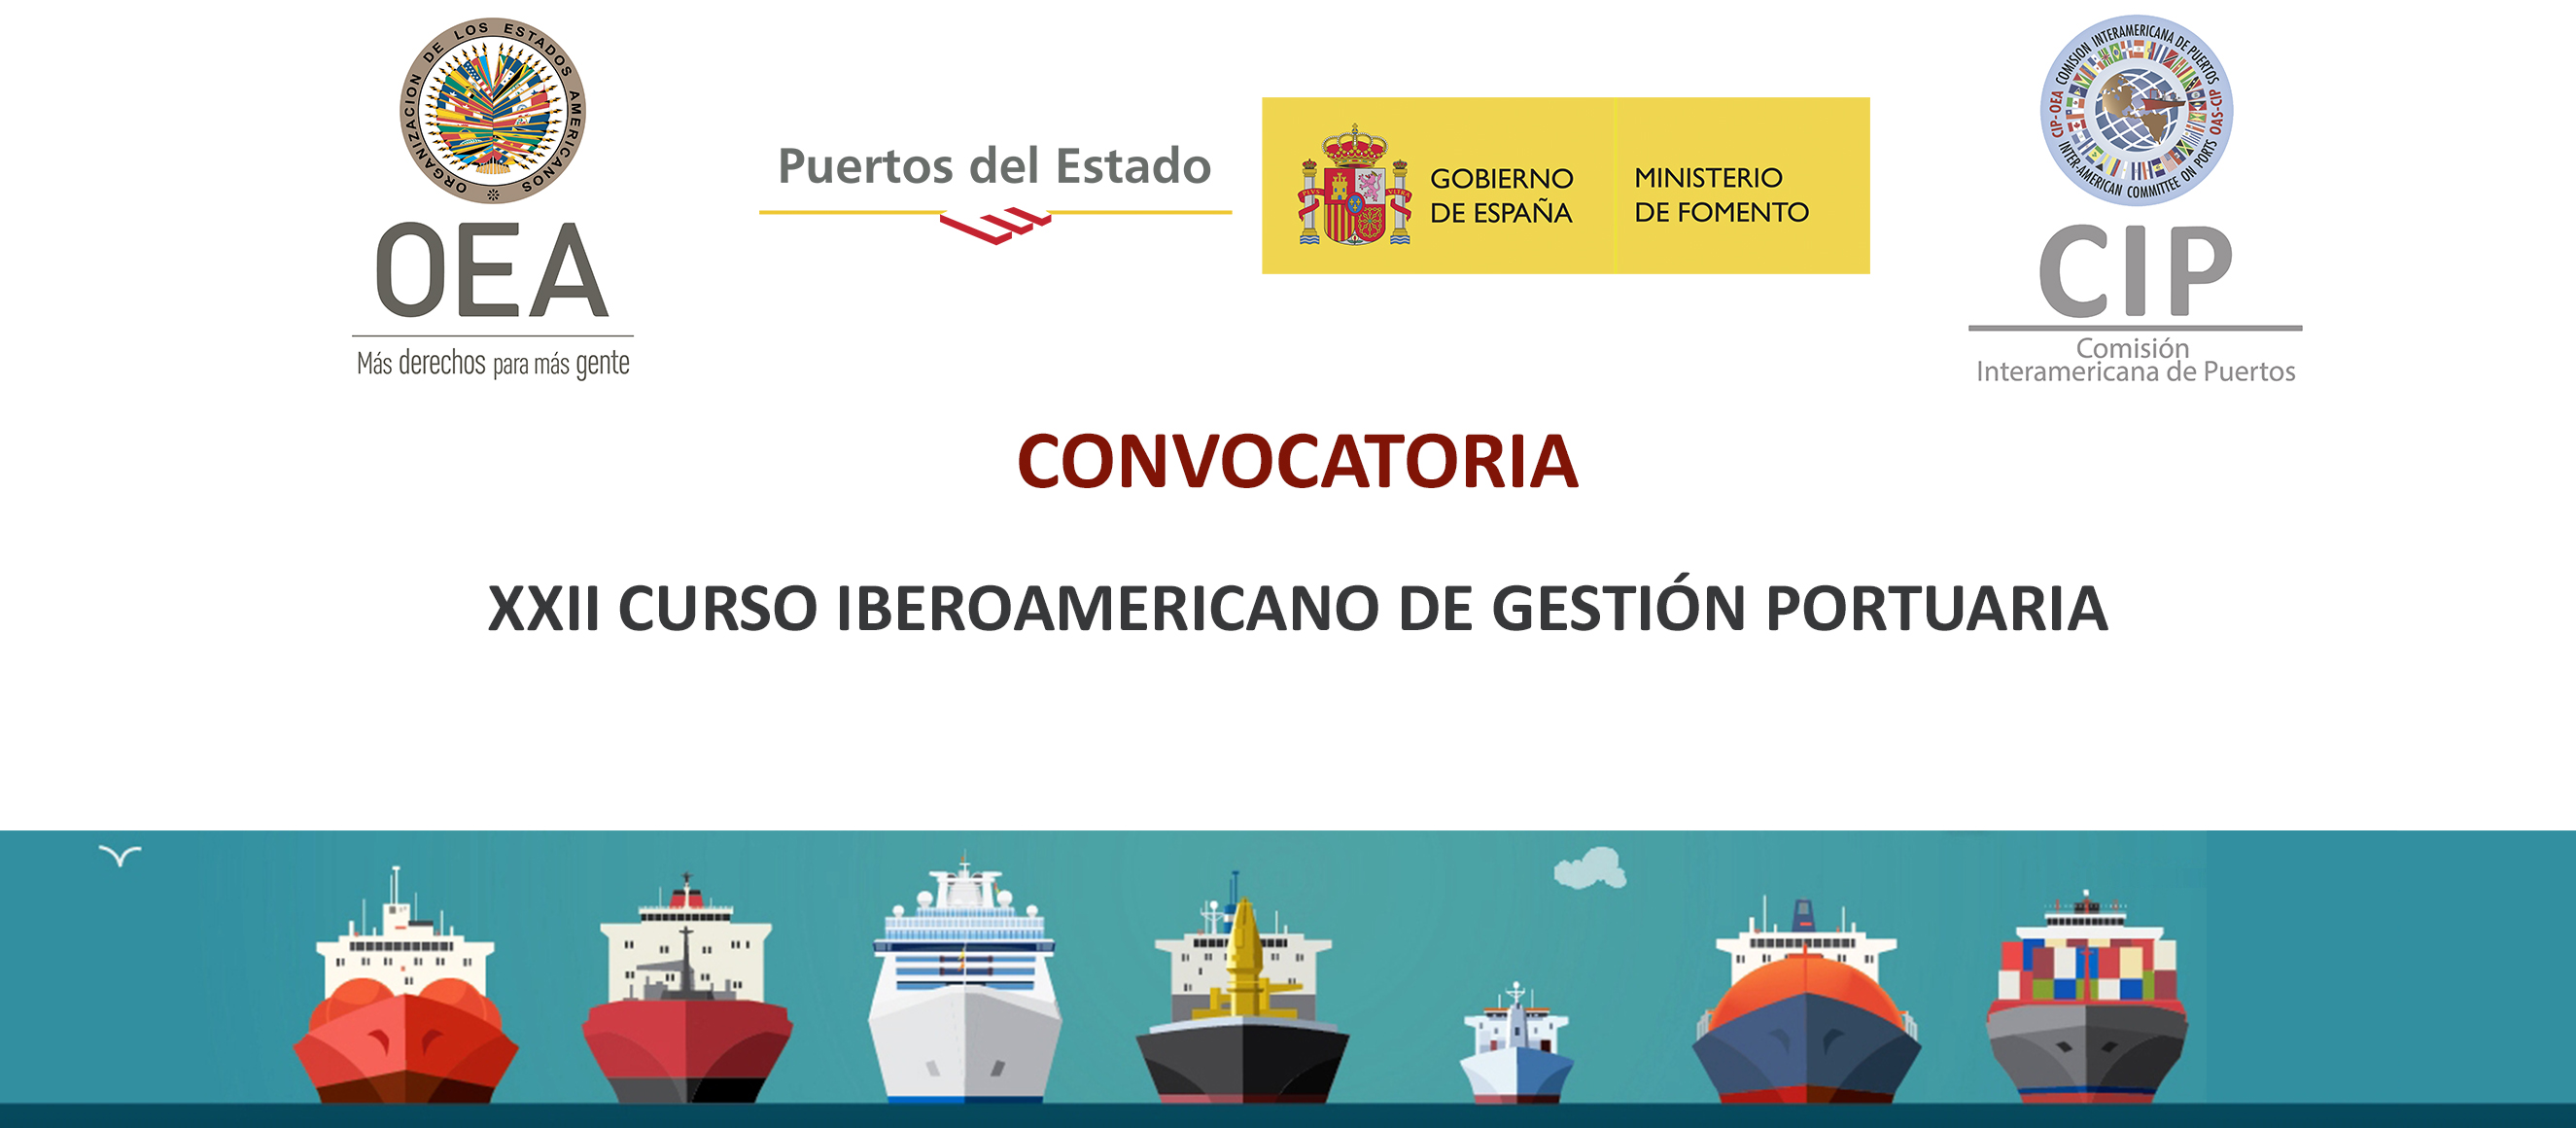 XXII Curso Iberoamericano de Gestión Portuaria